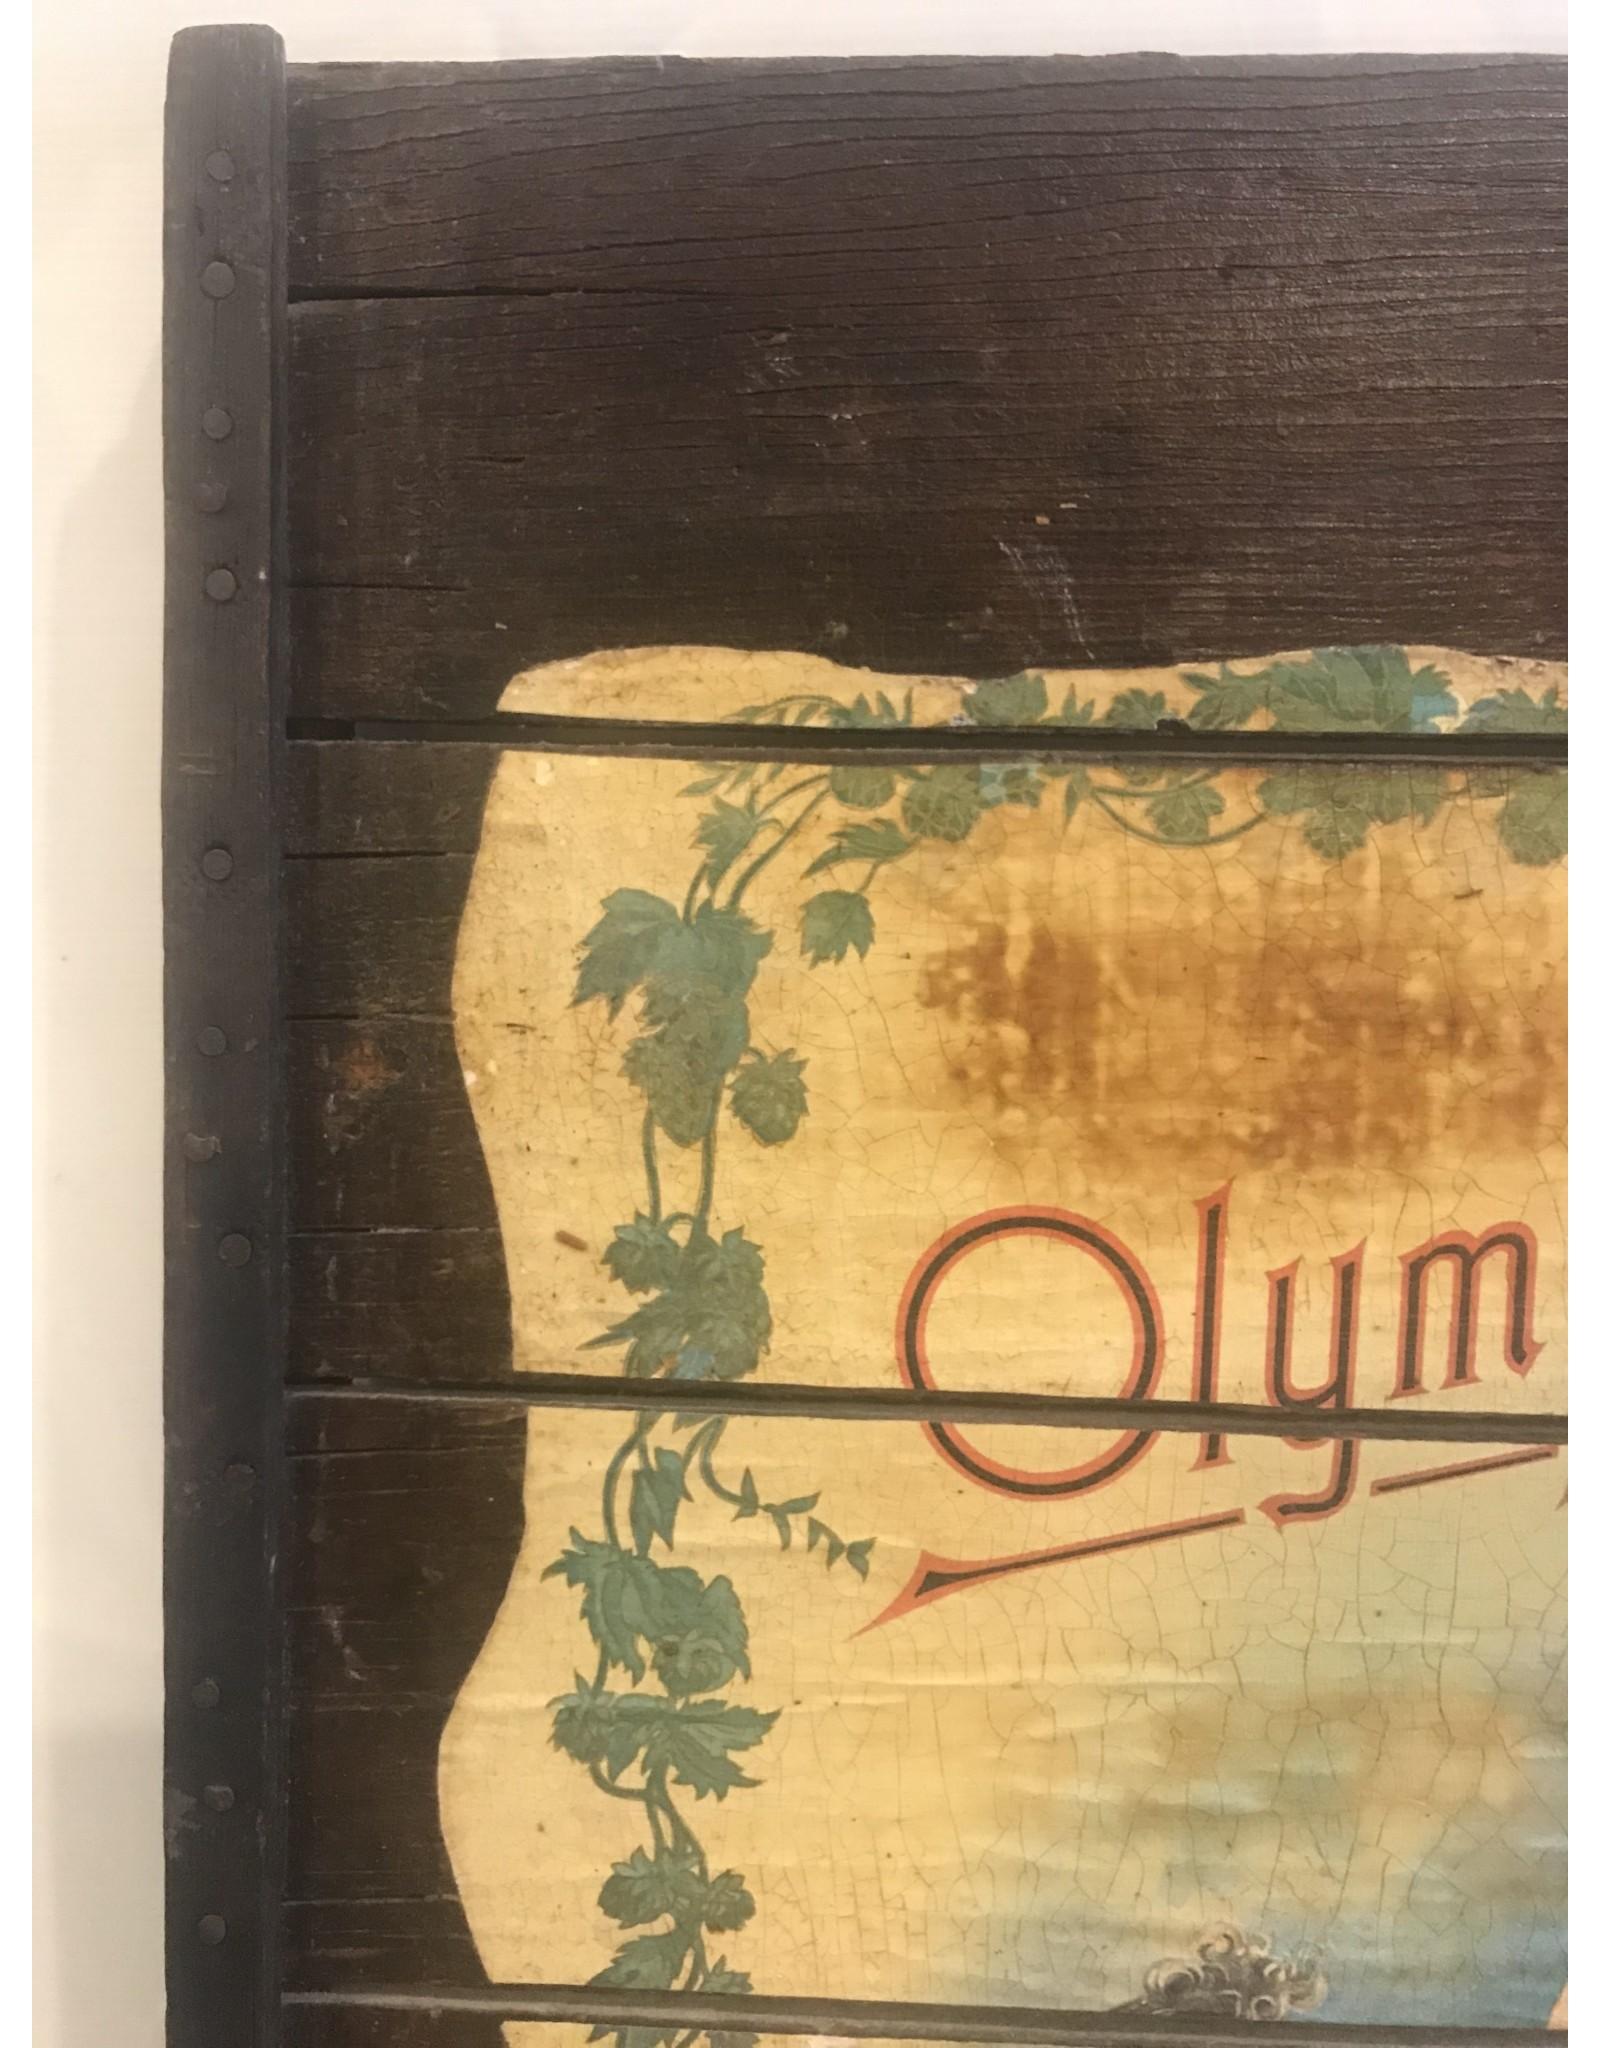 SPV Olympia Beer Wooden old plaque